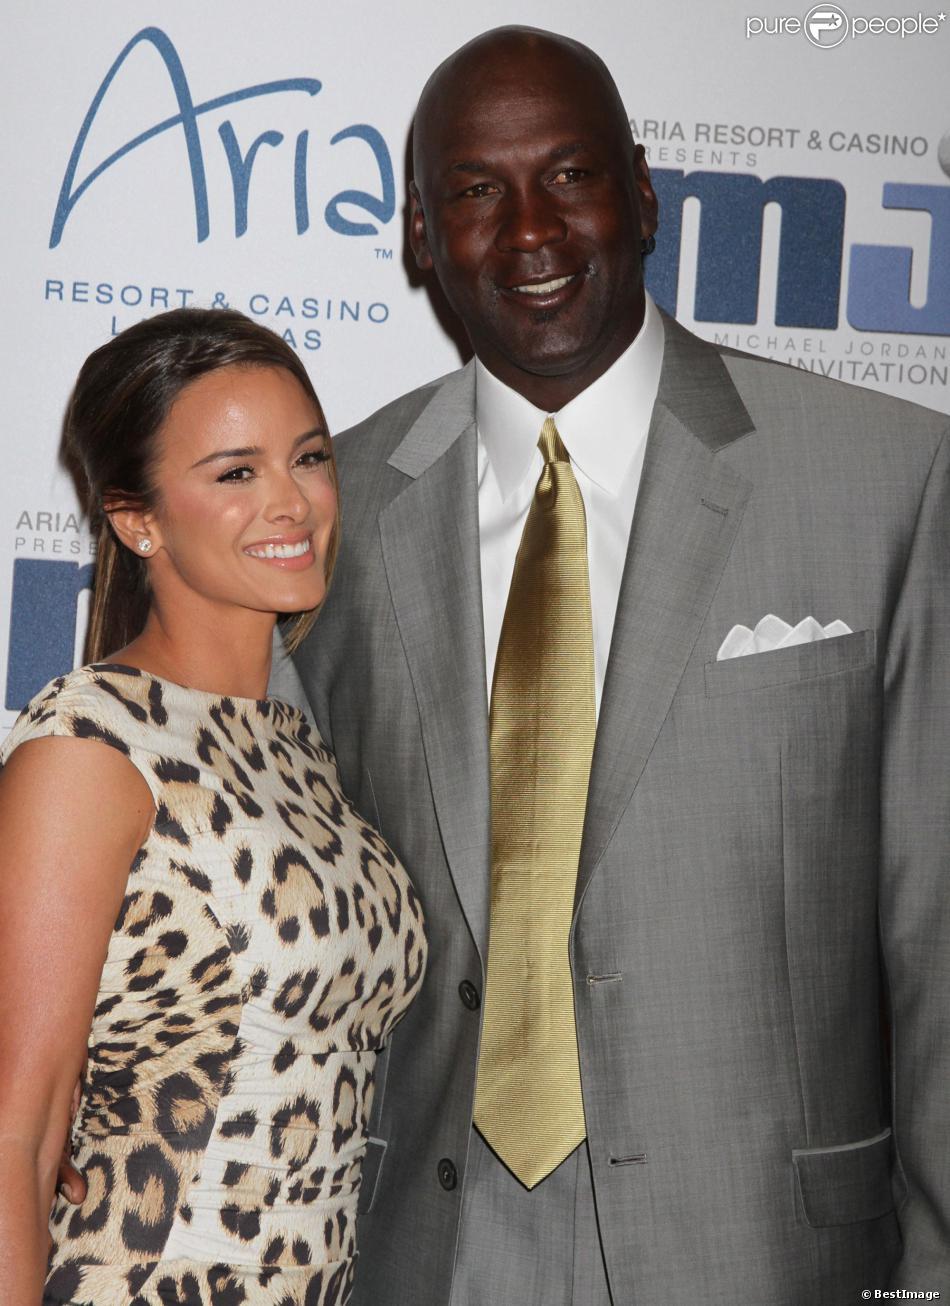 Michael Jordan et sa femme Yvette Prieto lors du 11e Annual Michael Jordan celebrity invitational gala à l'Aria Resort and Casino de Las Vegas le 30 mars 2012